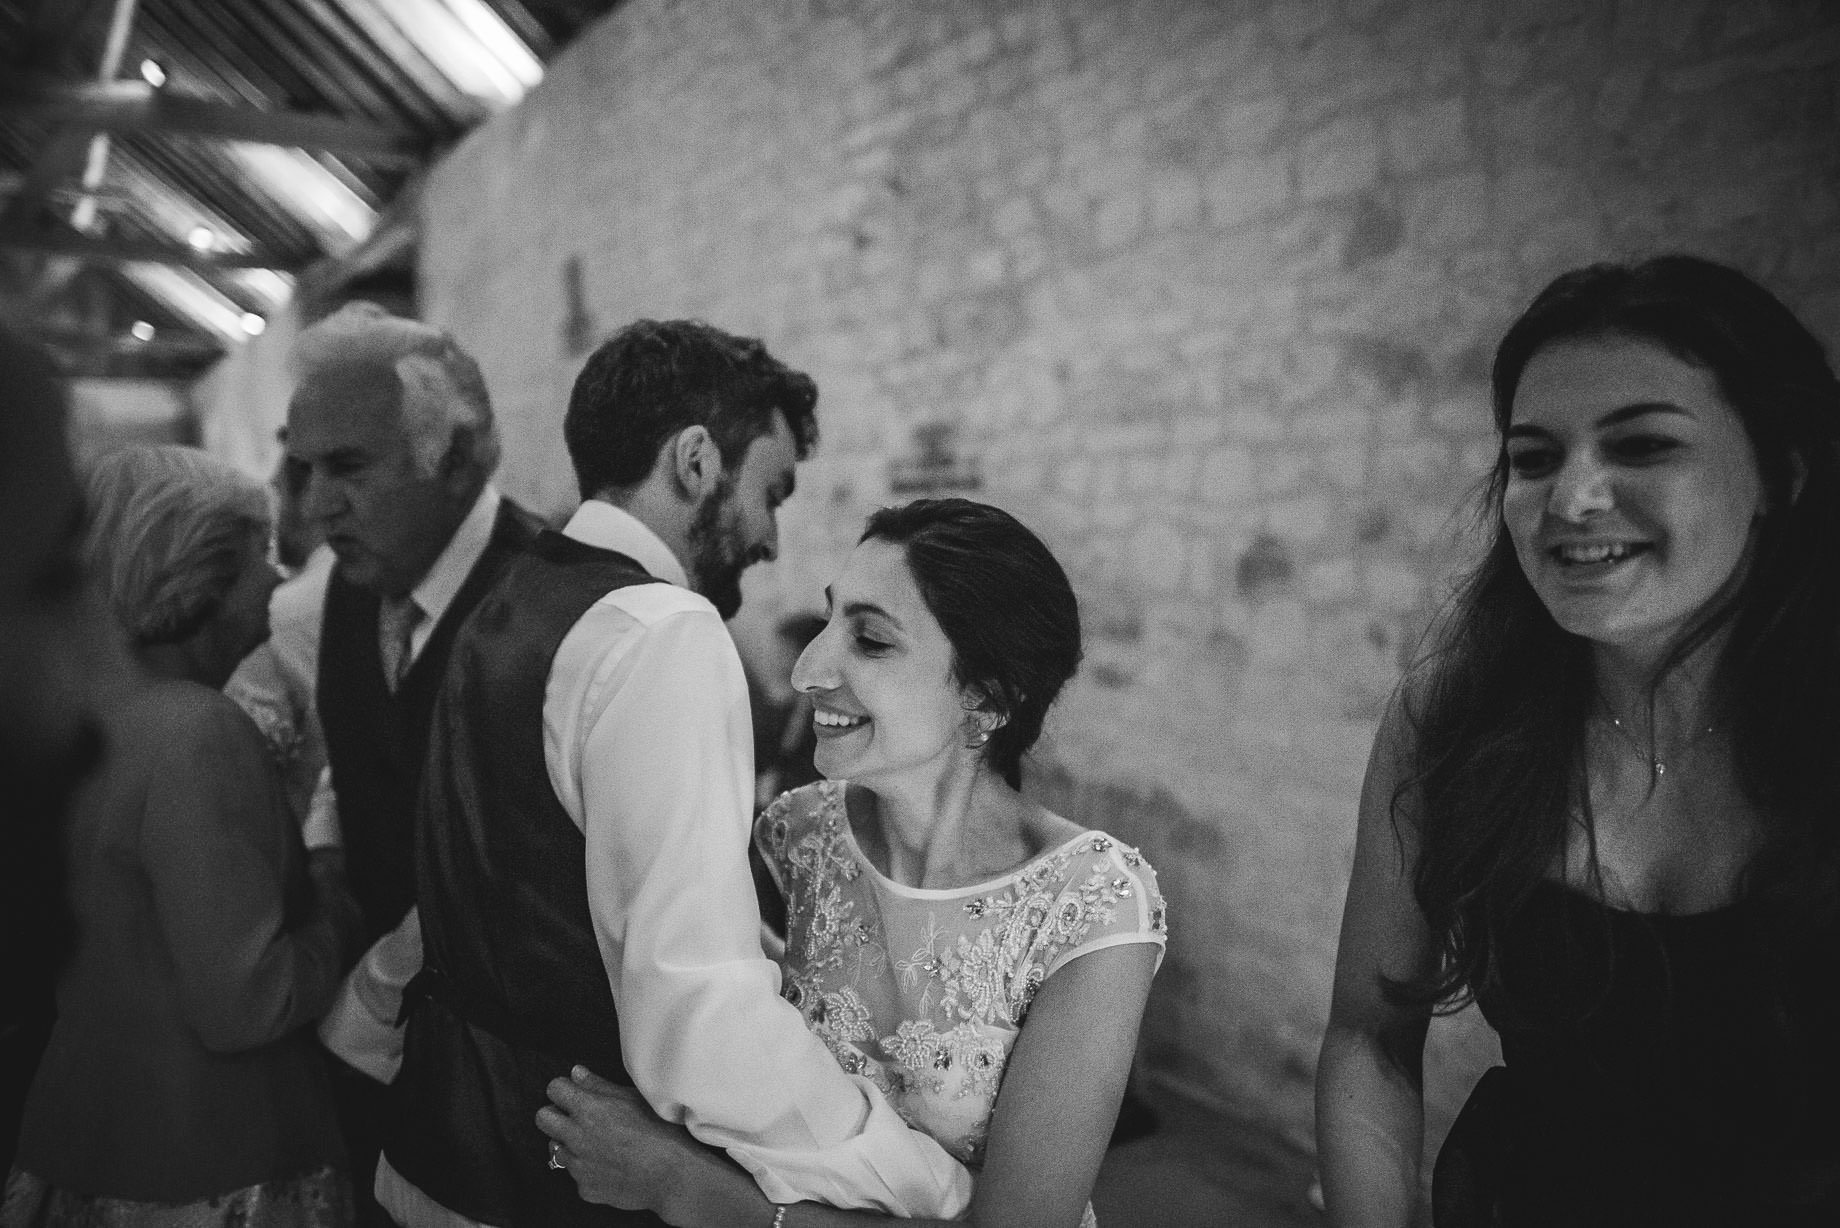 bury-court-barn-wedding-photography-guy-collier-photography-nadia-tom-178-of-184